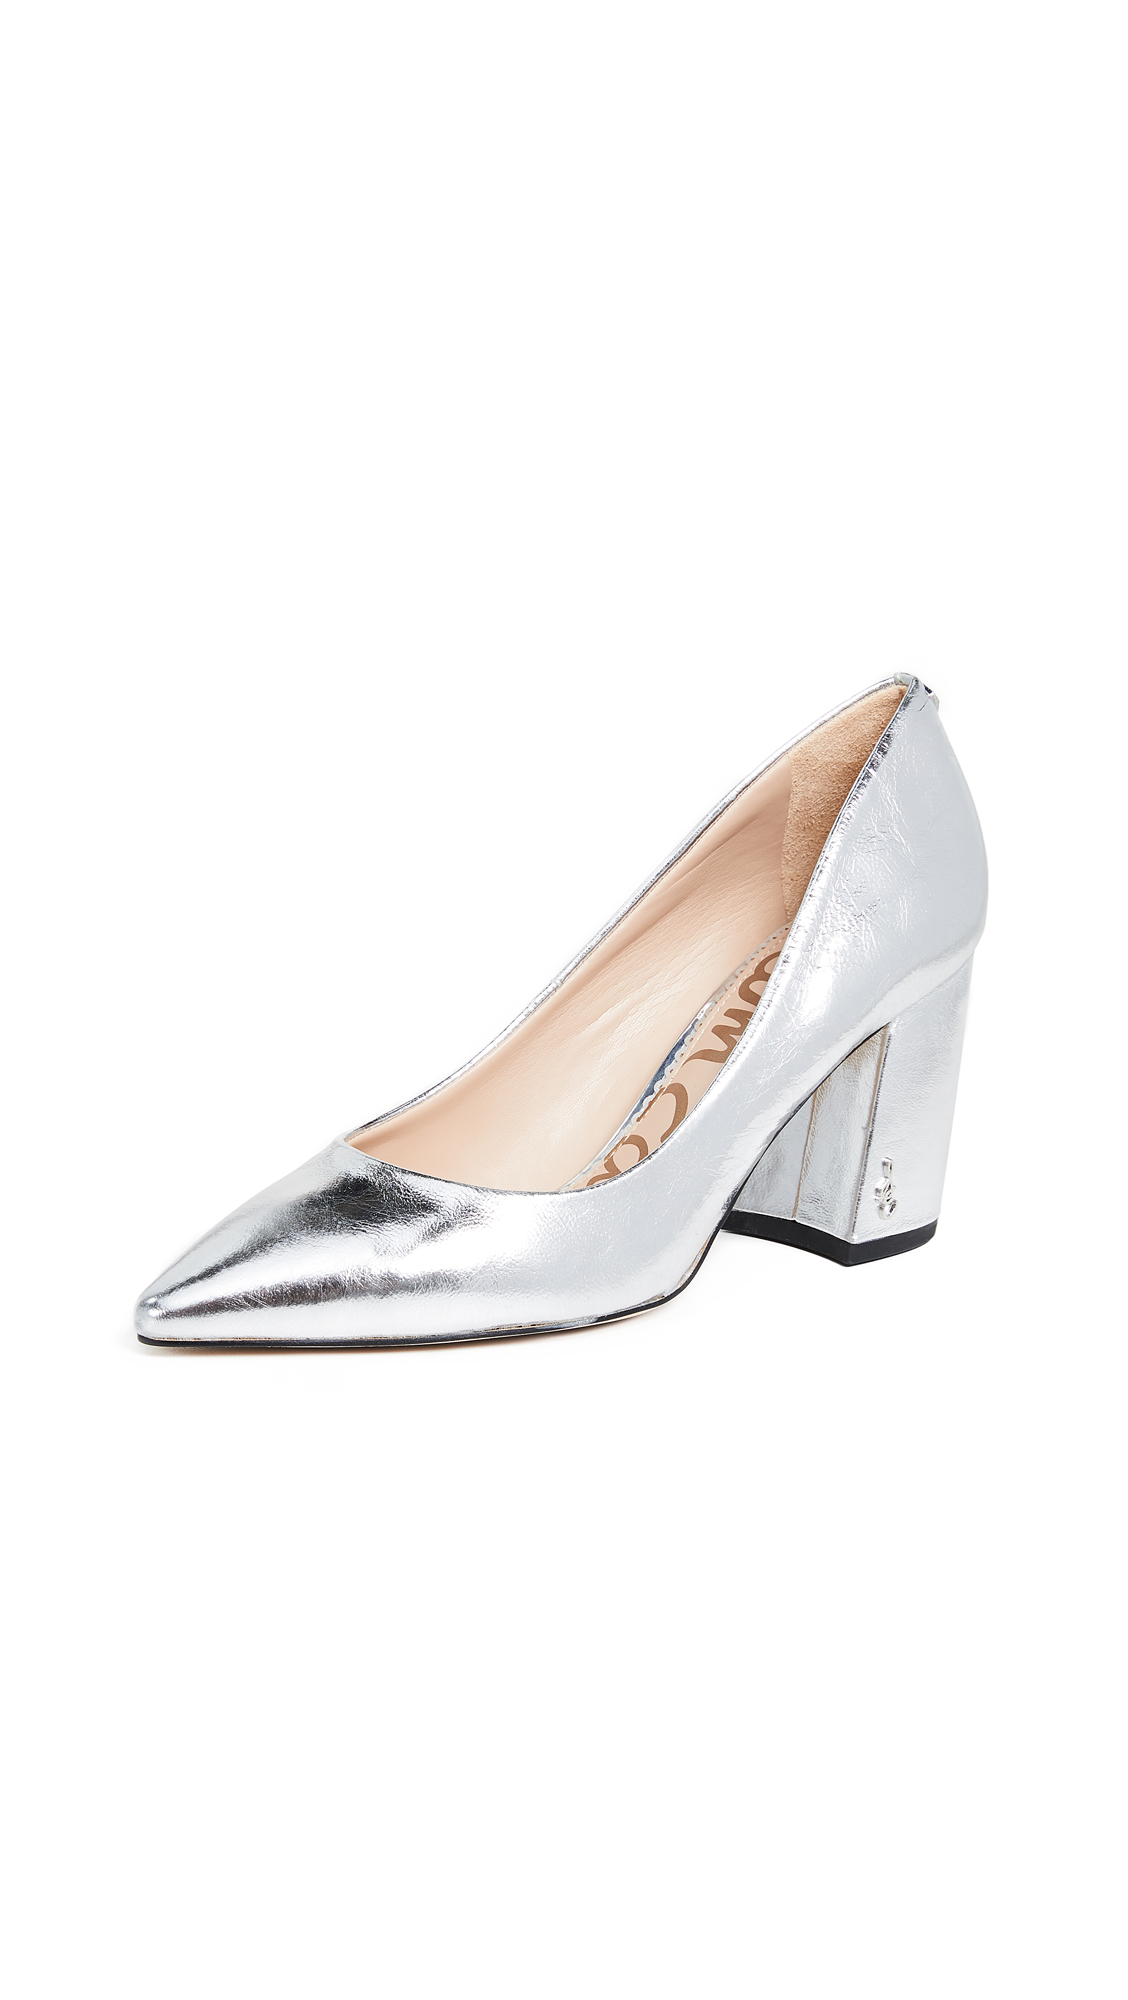 Sam Edelman Tatiana Pumps - Soft Silver